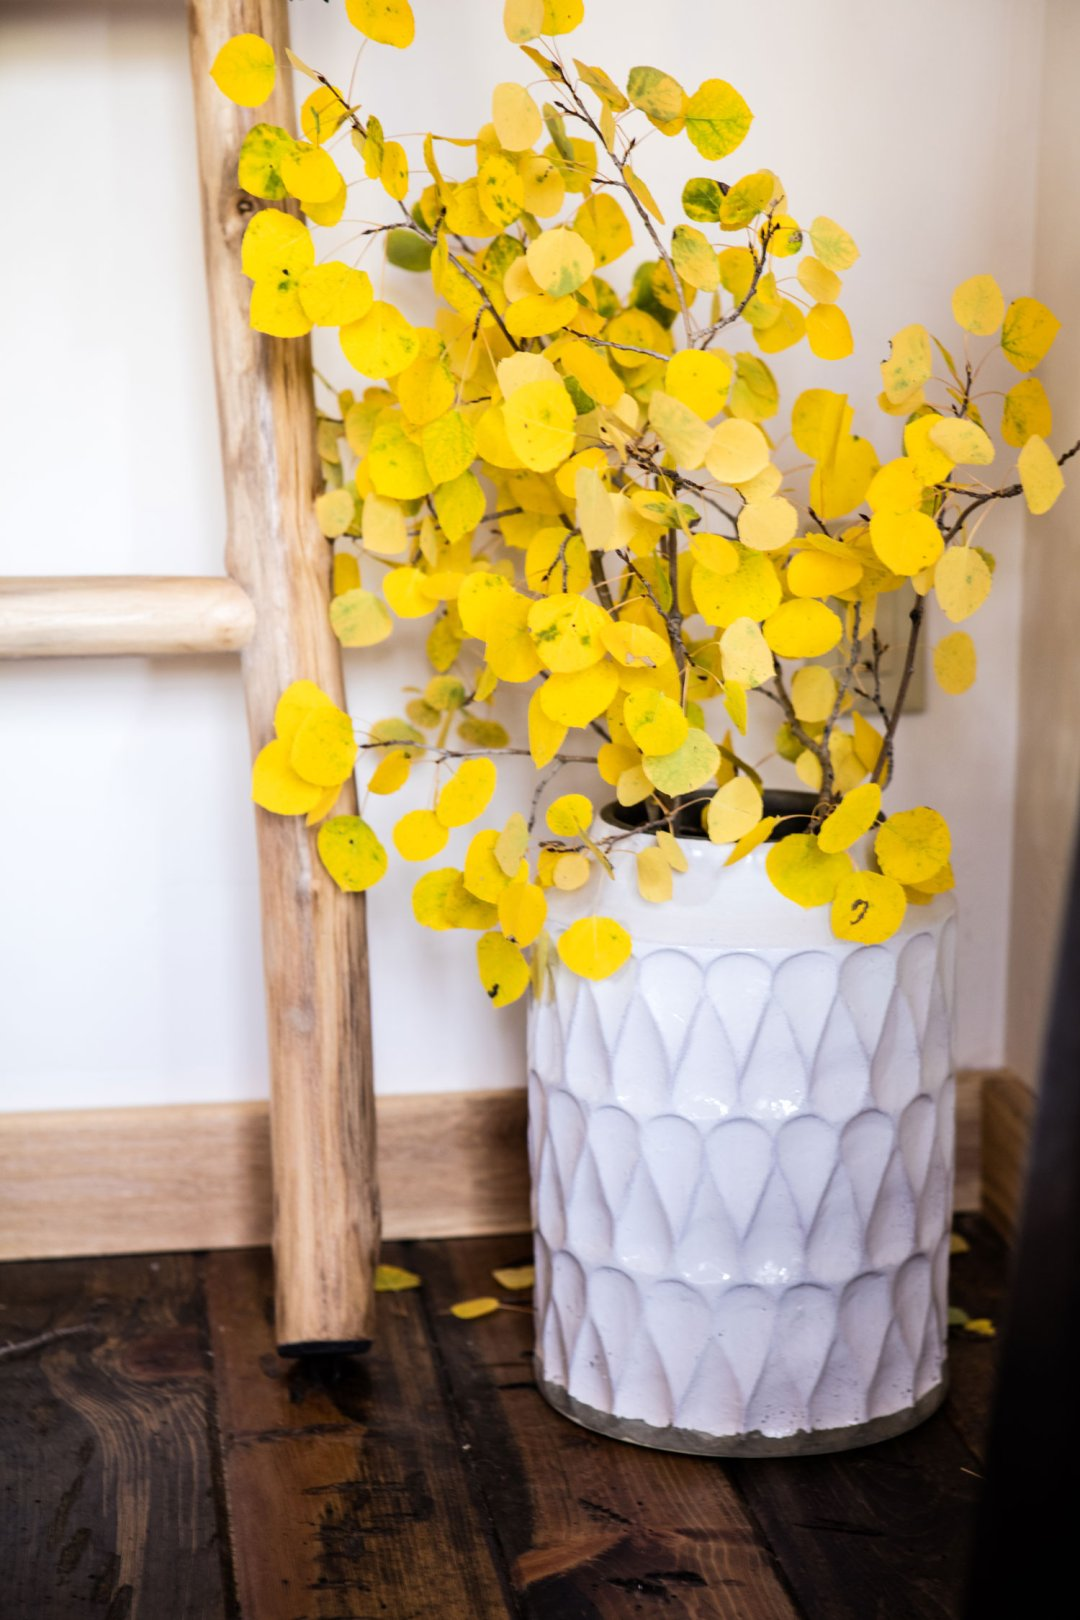 Large white ceramic vase of yellow leaves